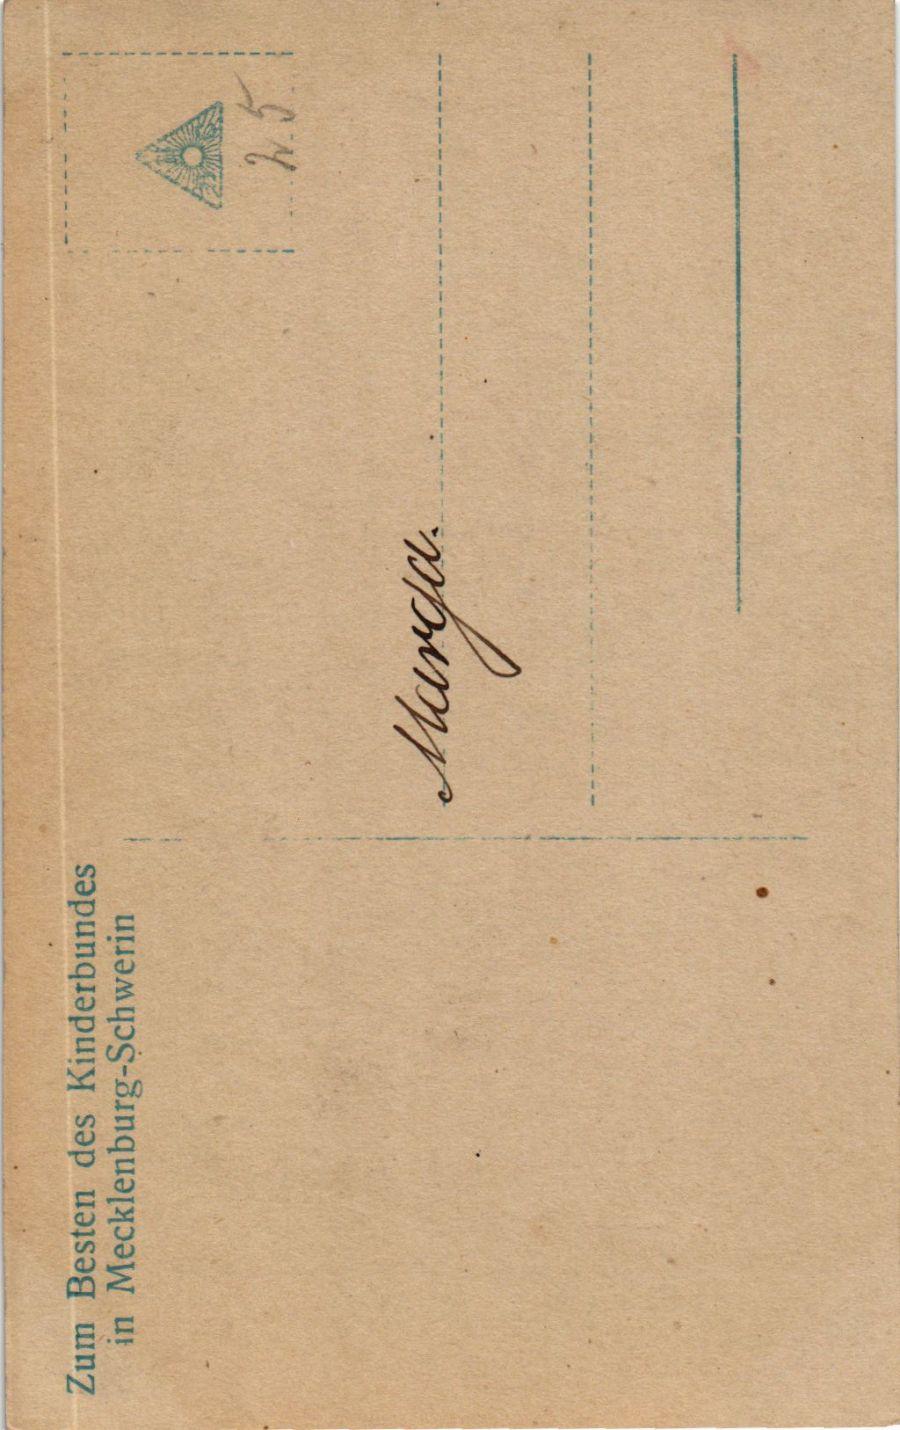 CPA-AK-Herzog-Christian-Ludwig-v-Mecklenburg-Schwerin-GERMAN-ROYALTY-867718 Indexbild 2